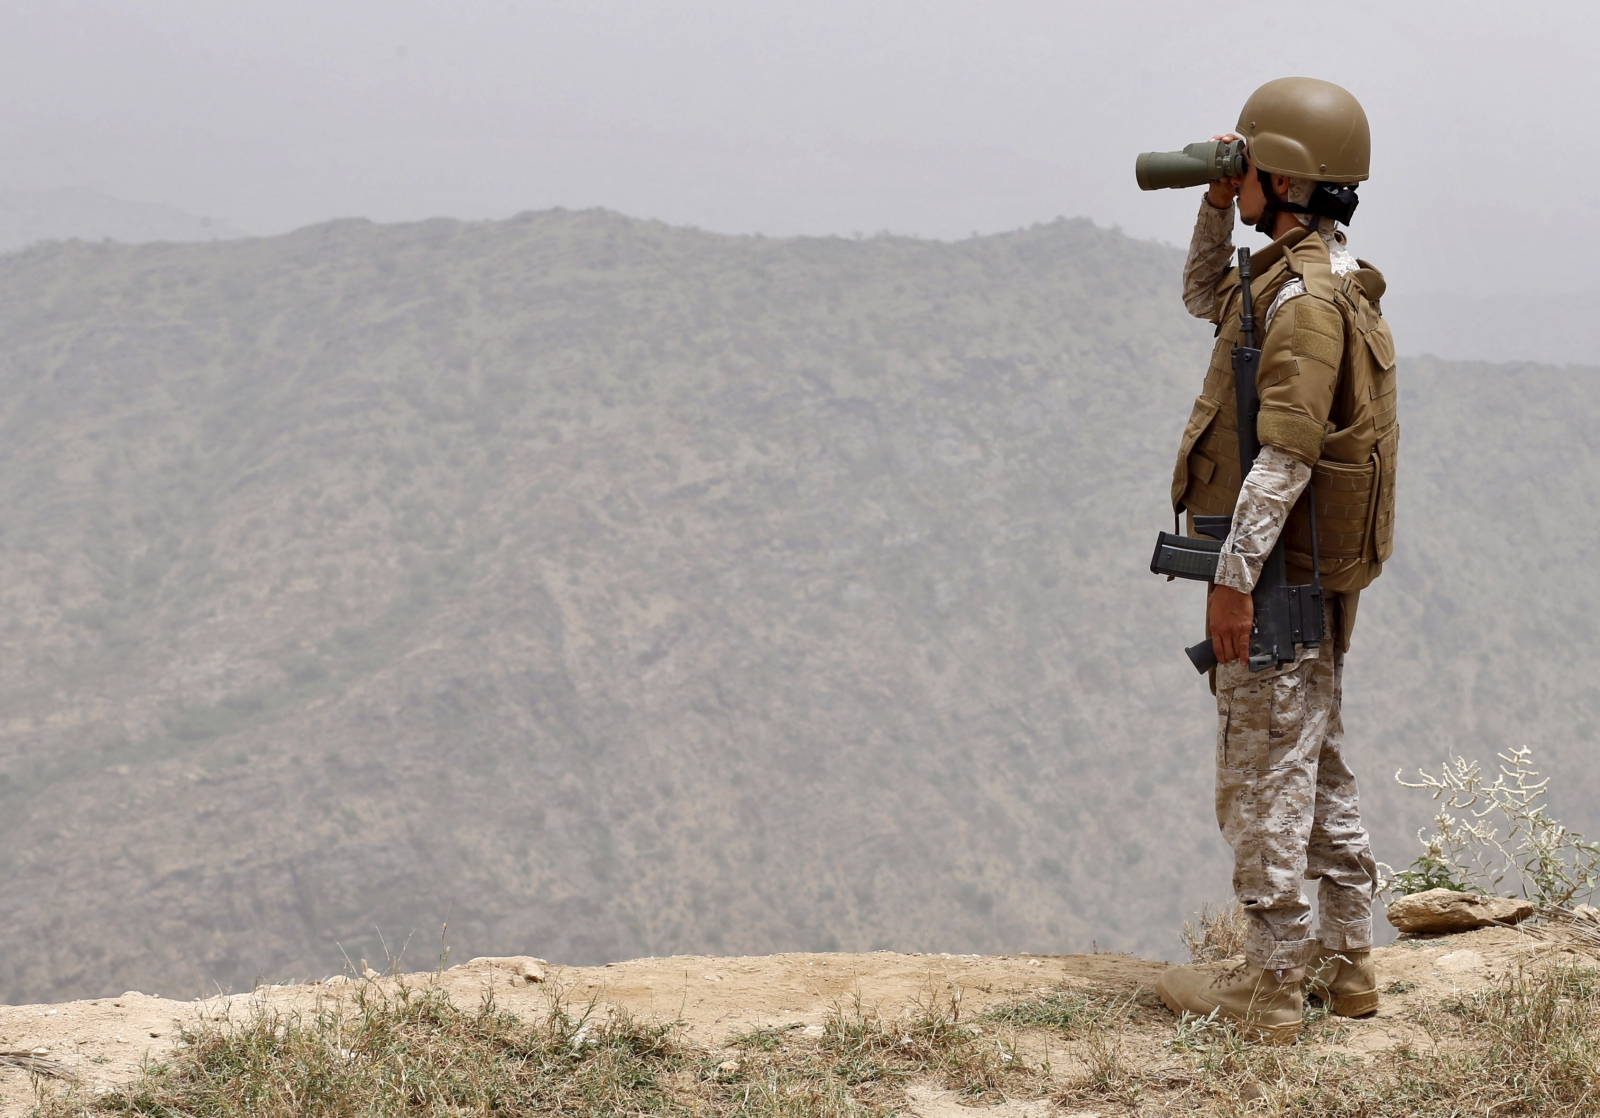 Saudi Arabia military offensive in Yemen